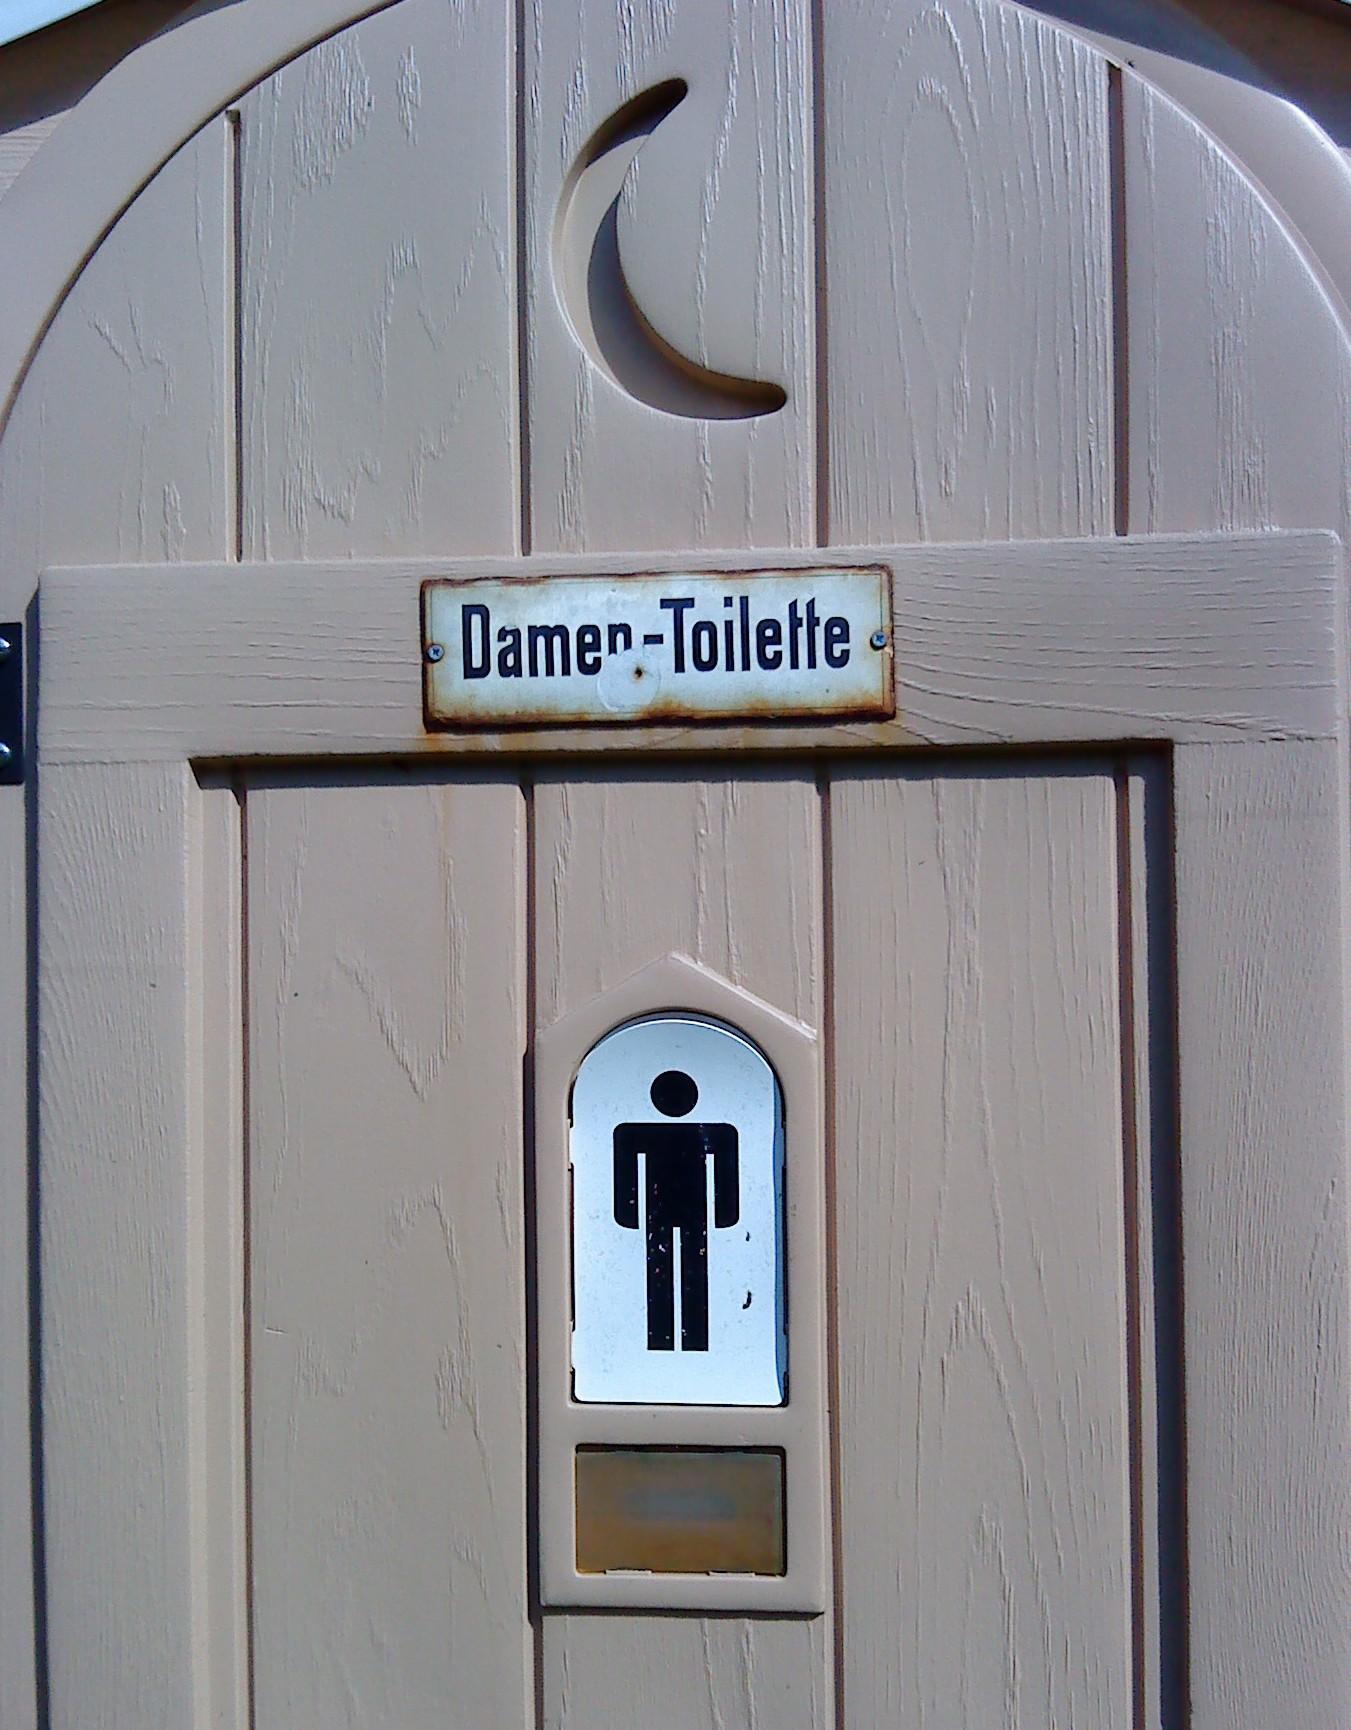 Toiletten-Piktogramm-Botschaften (I)